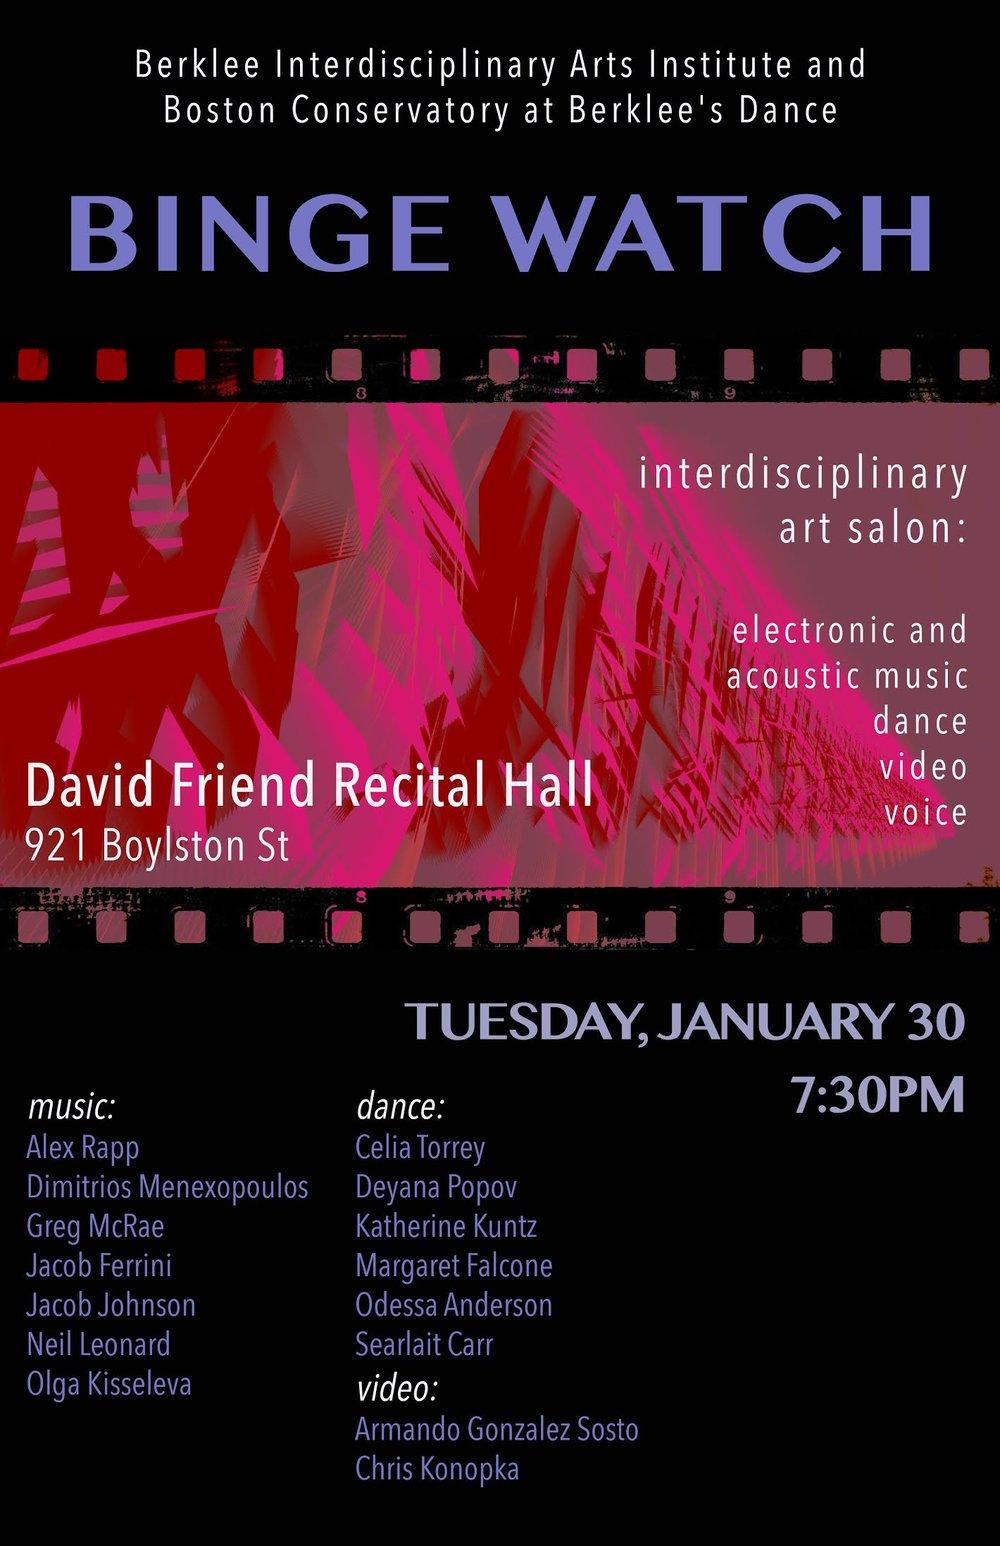 Tuesday /Jan 30, 2018 / 7:30pm - Binge Watch -Interdisciplinary Art Salon - David Friend Recital Hall921 Boylston StreetBoston, MA, 02115, USevent link...